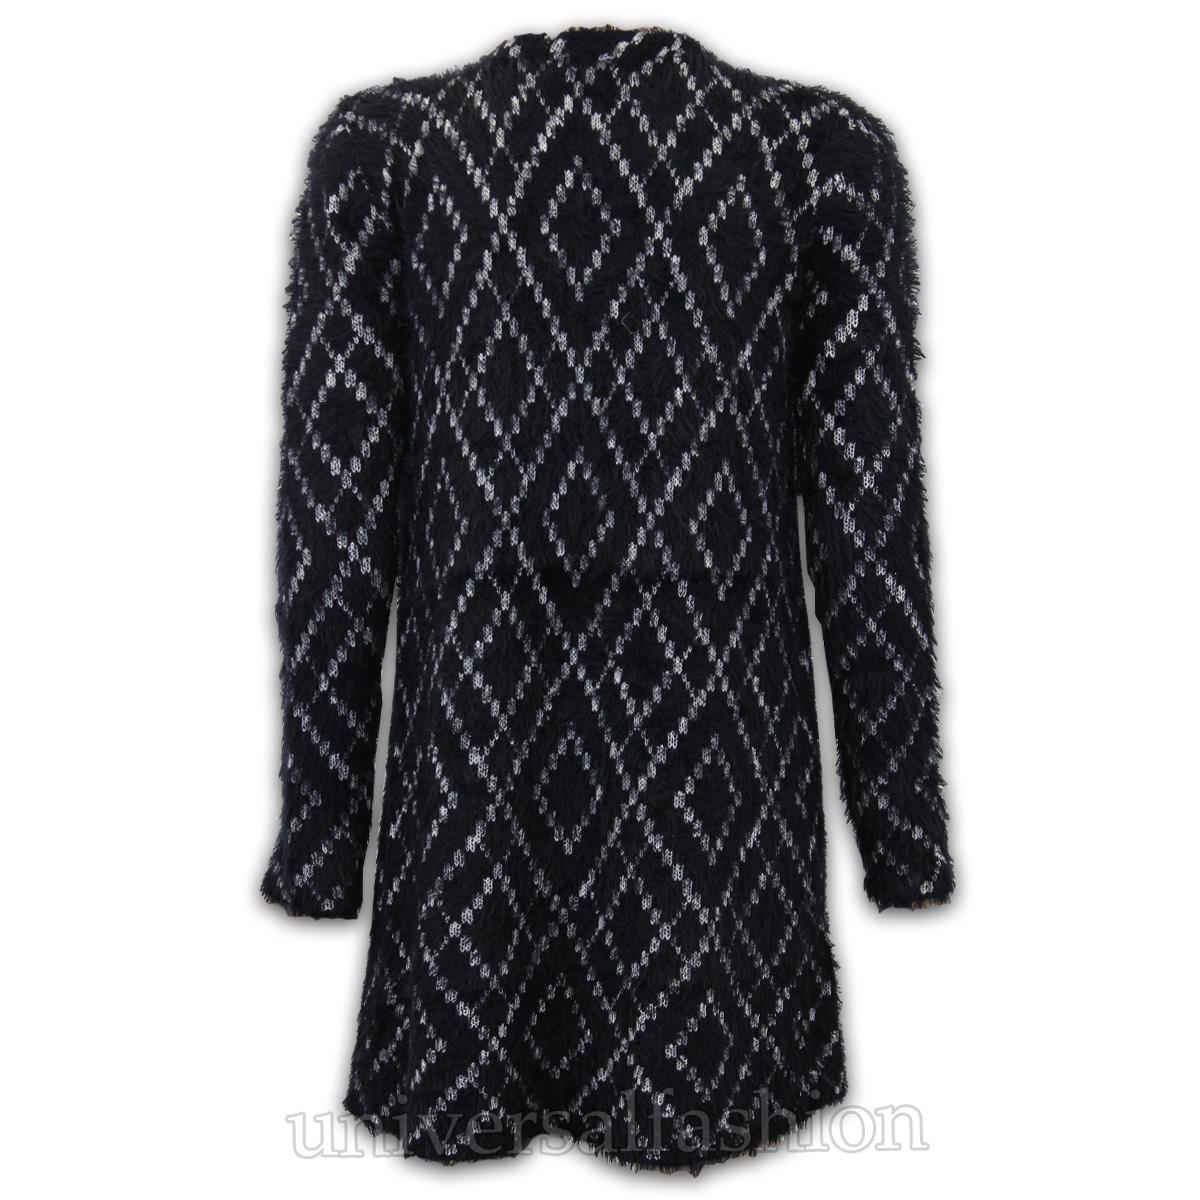 Ladies Cardigan Brave Soul Mohair Womens Knitted Boyfriend Eyelash Casual Winter